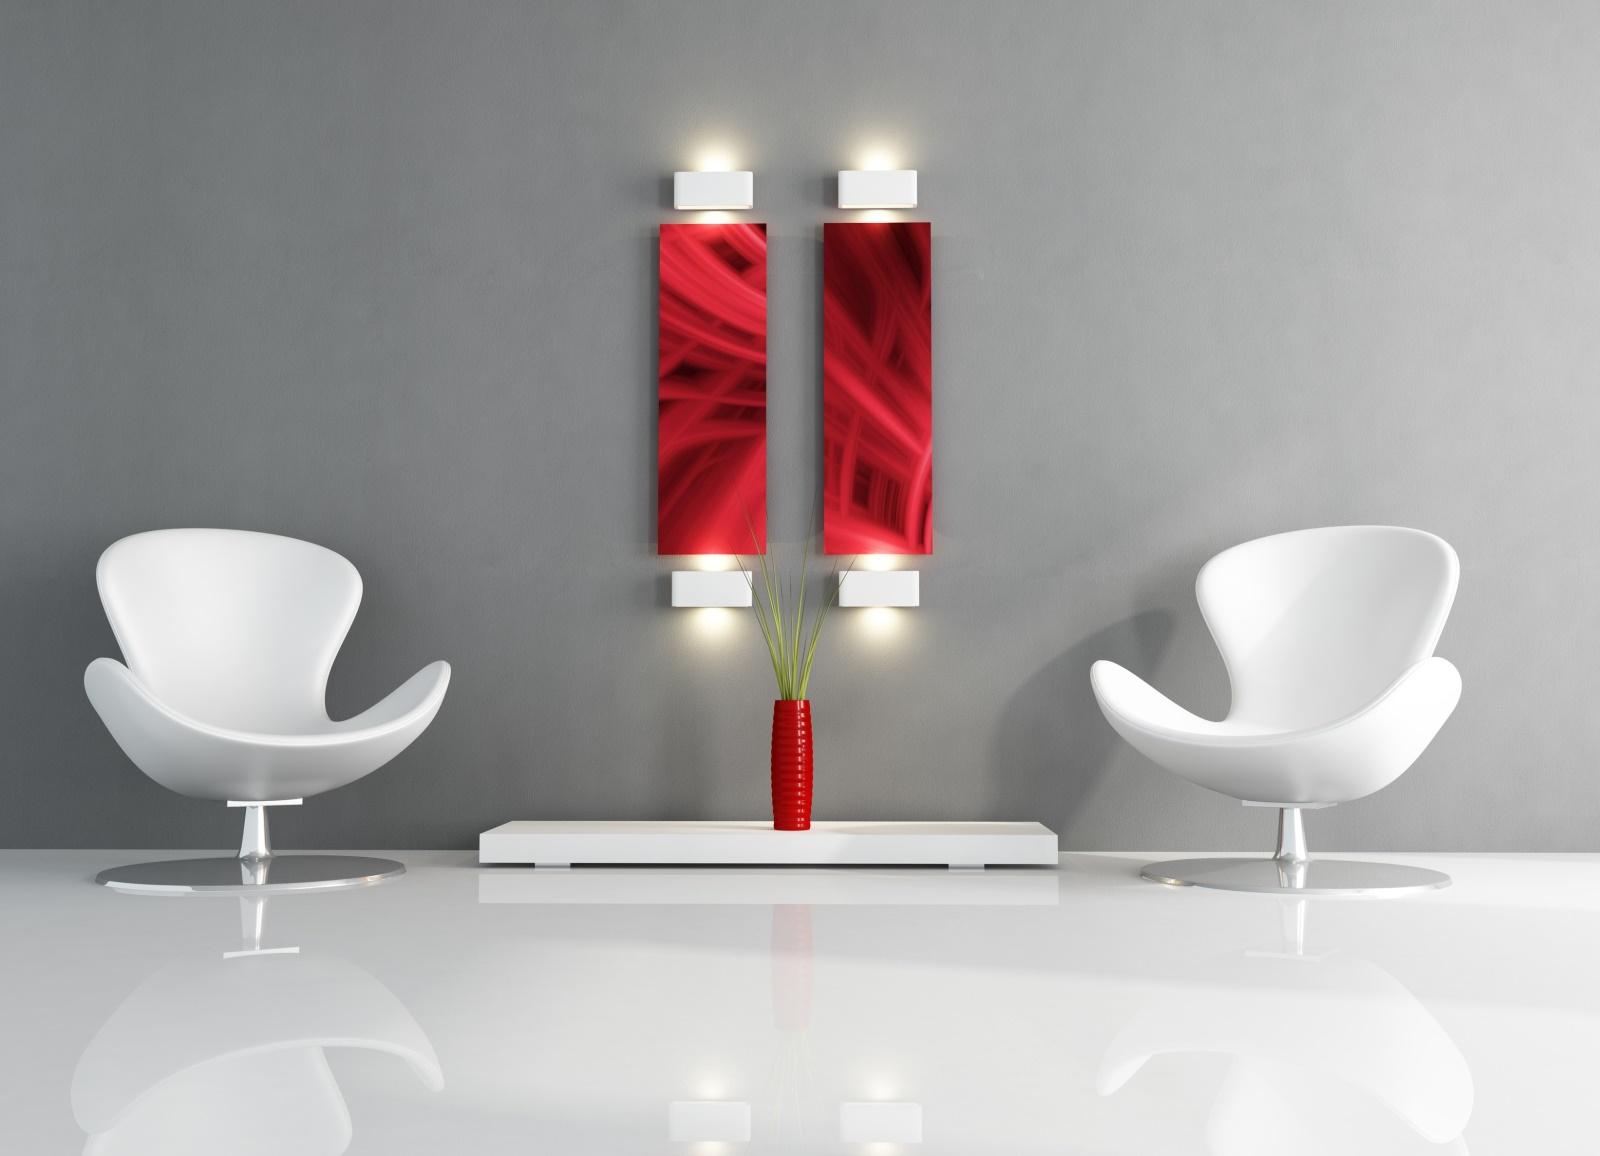 firmenservice kunst f r b ro praxis kanzlei poster galerie m nchen. Black Bedroom Furniture Sets. Home Design Ideas